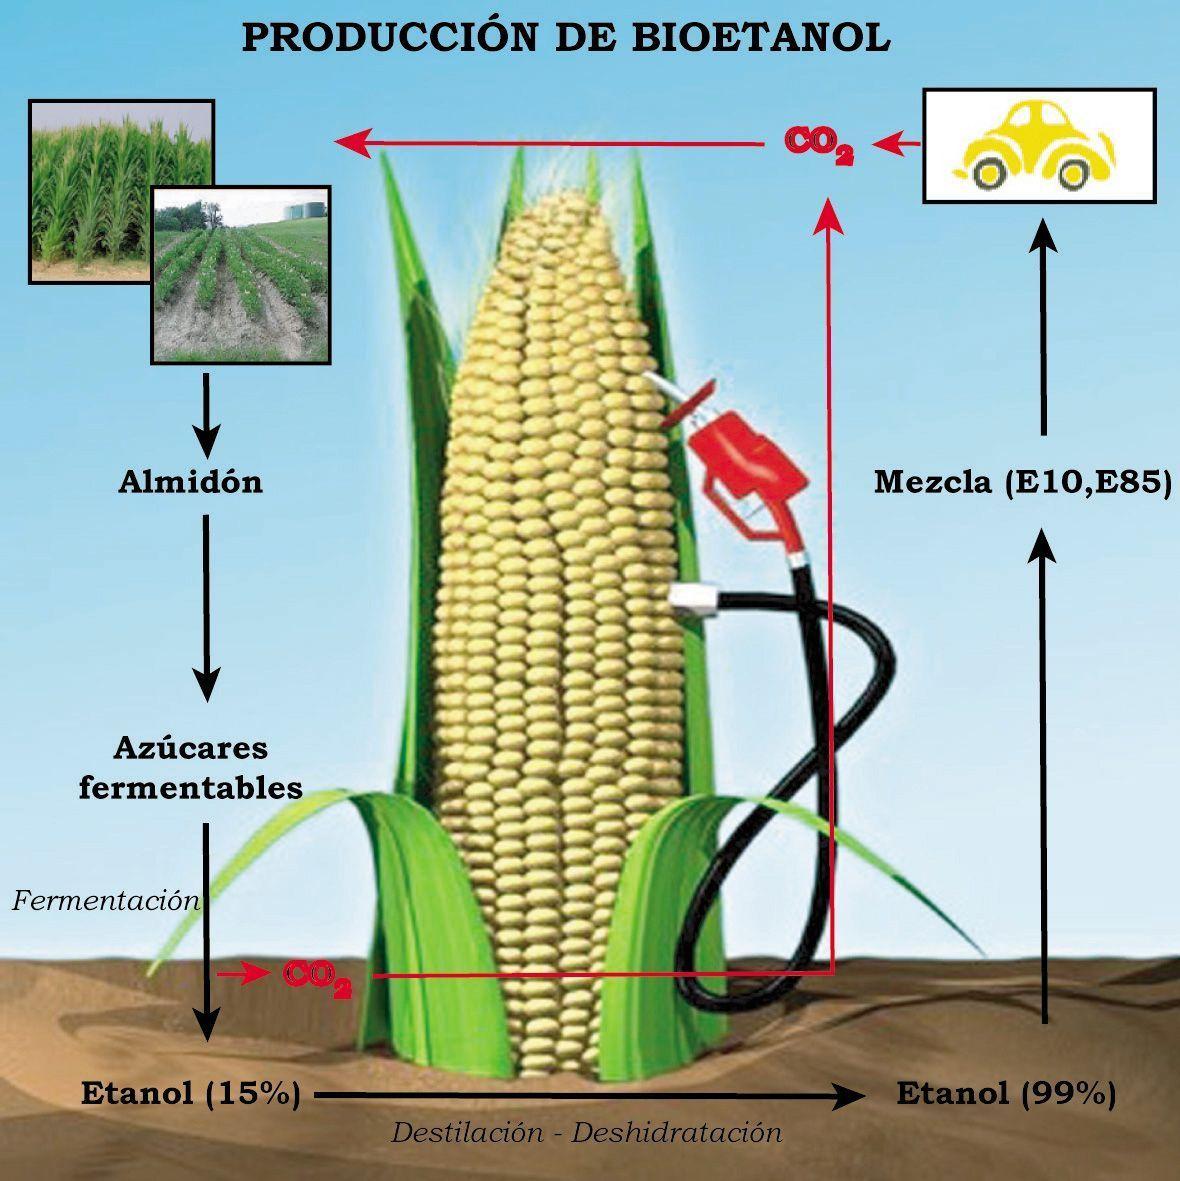 ciclo bioetanol para biochimeneas